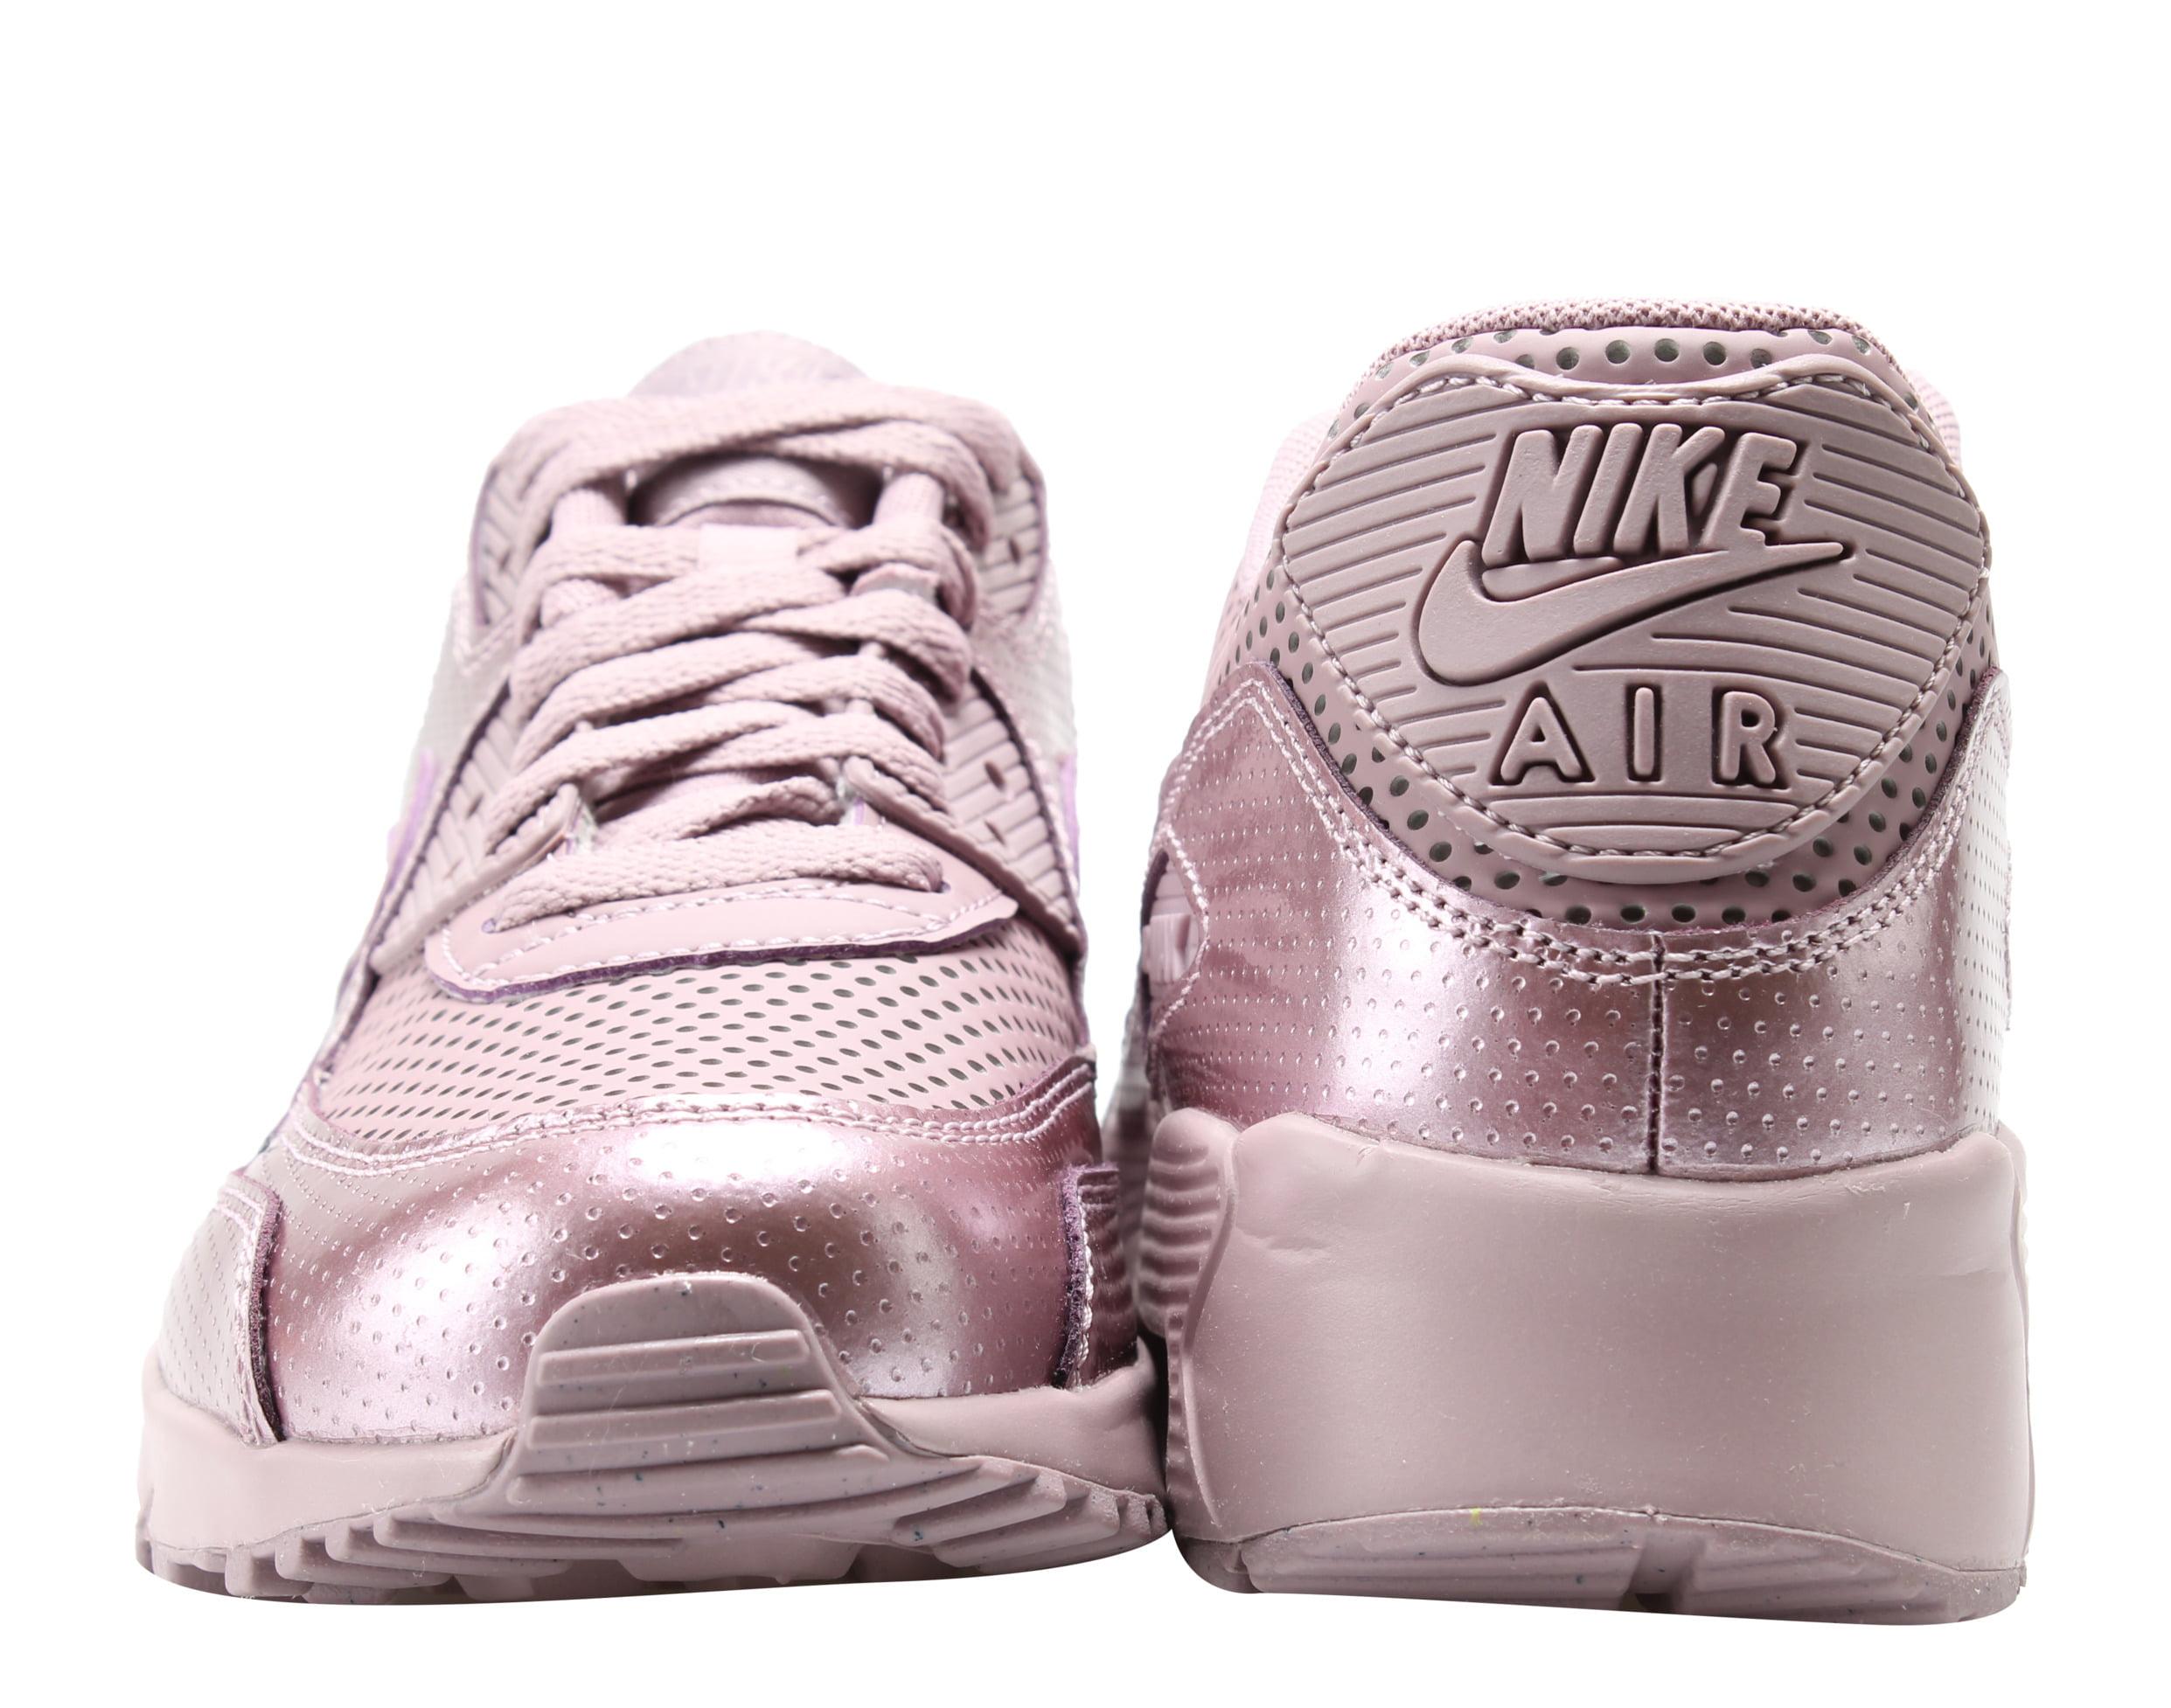 Nike Air Max 90 SE LTR (GS) Elemental Rose Big Kids Running Shoes 859633-600